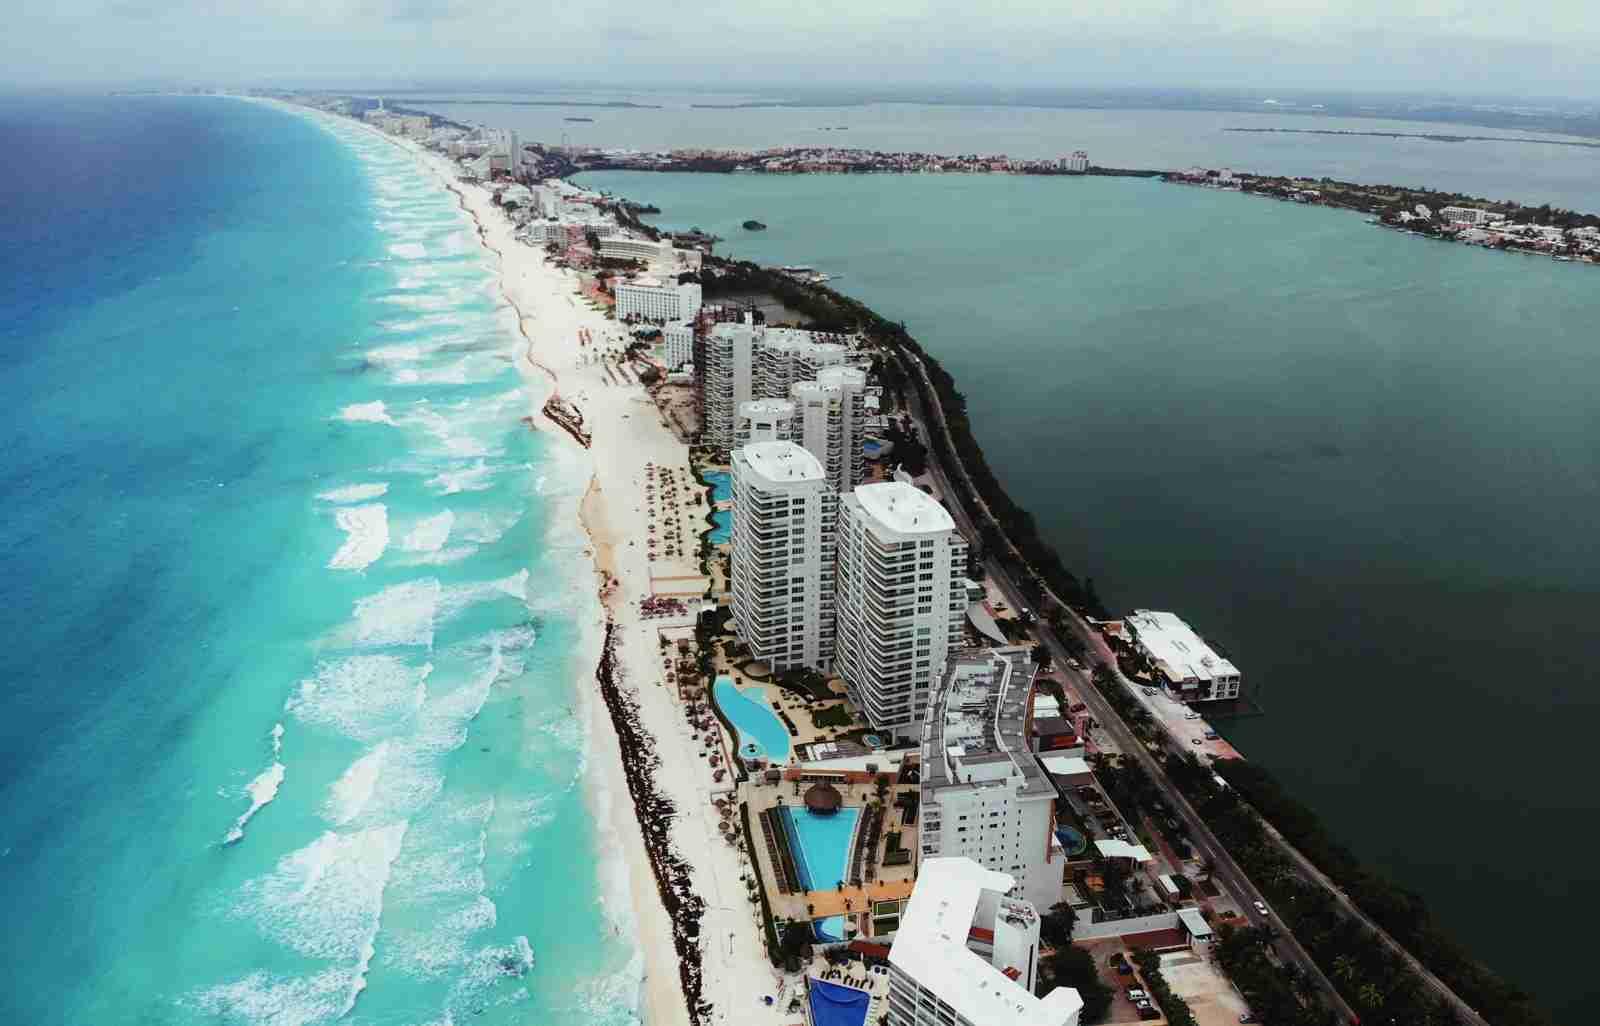 An aerial view of Quintana Roo, Mexico. (Photo via Shutterstock)